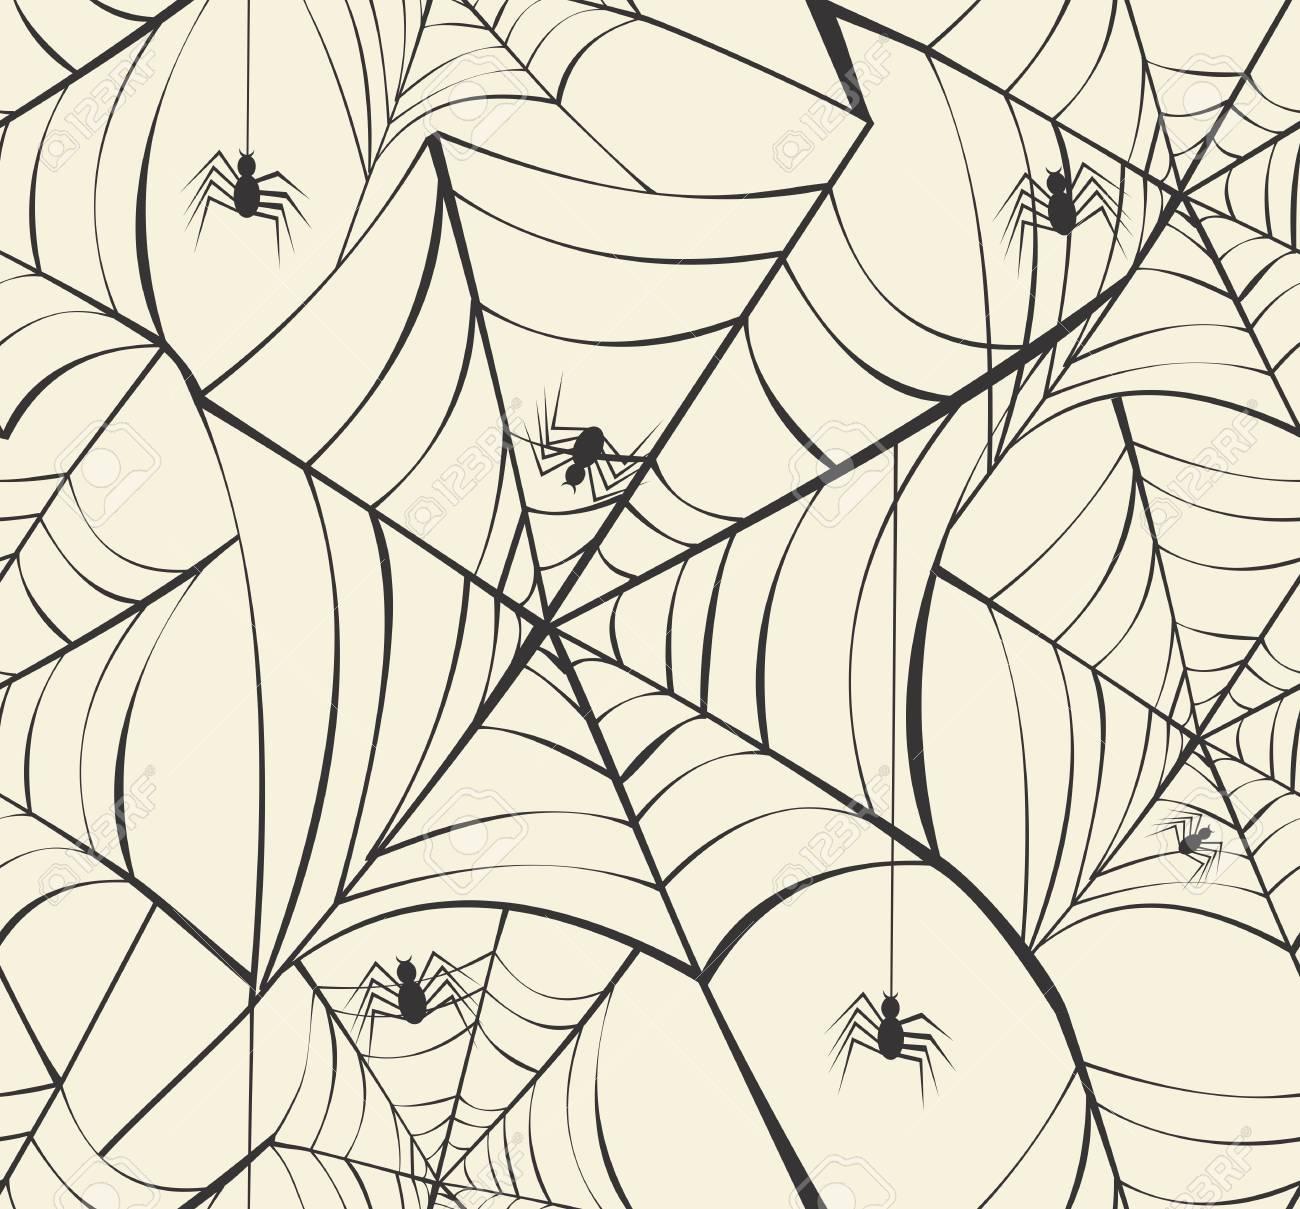 Happy Halloween spider webs seamless pattern background. Stock Vector - 22284426